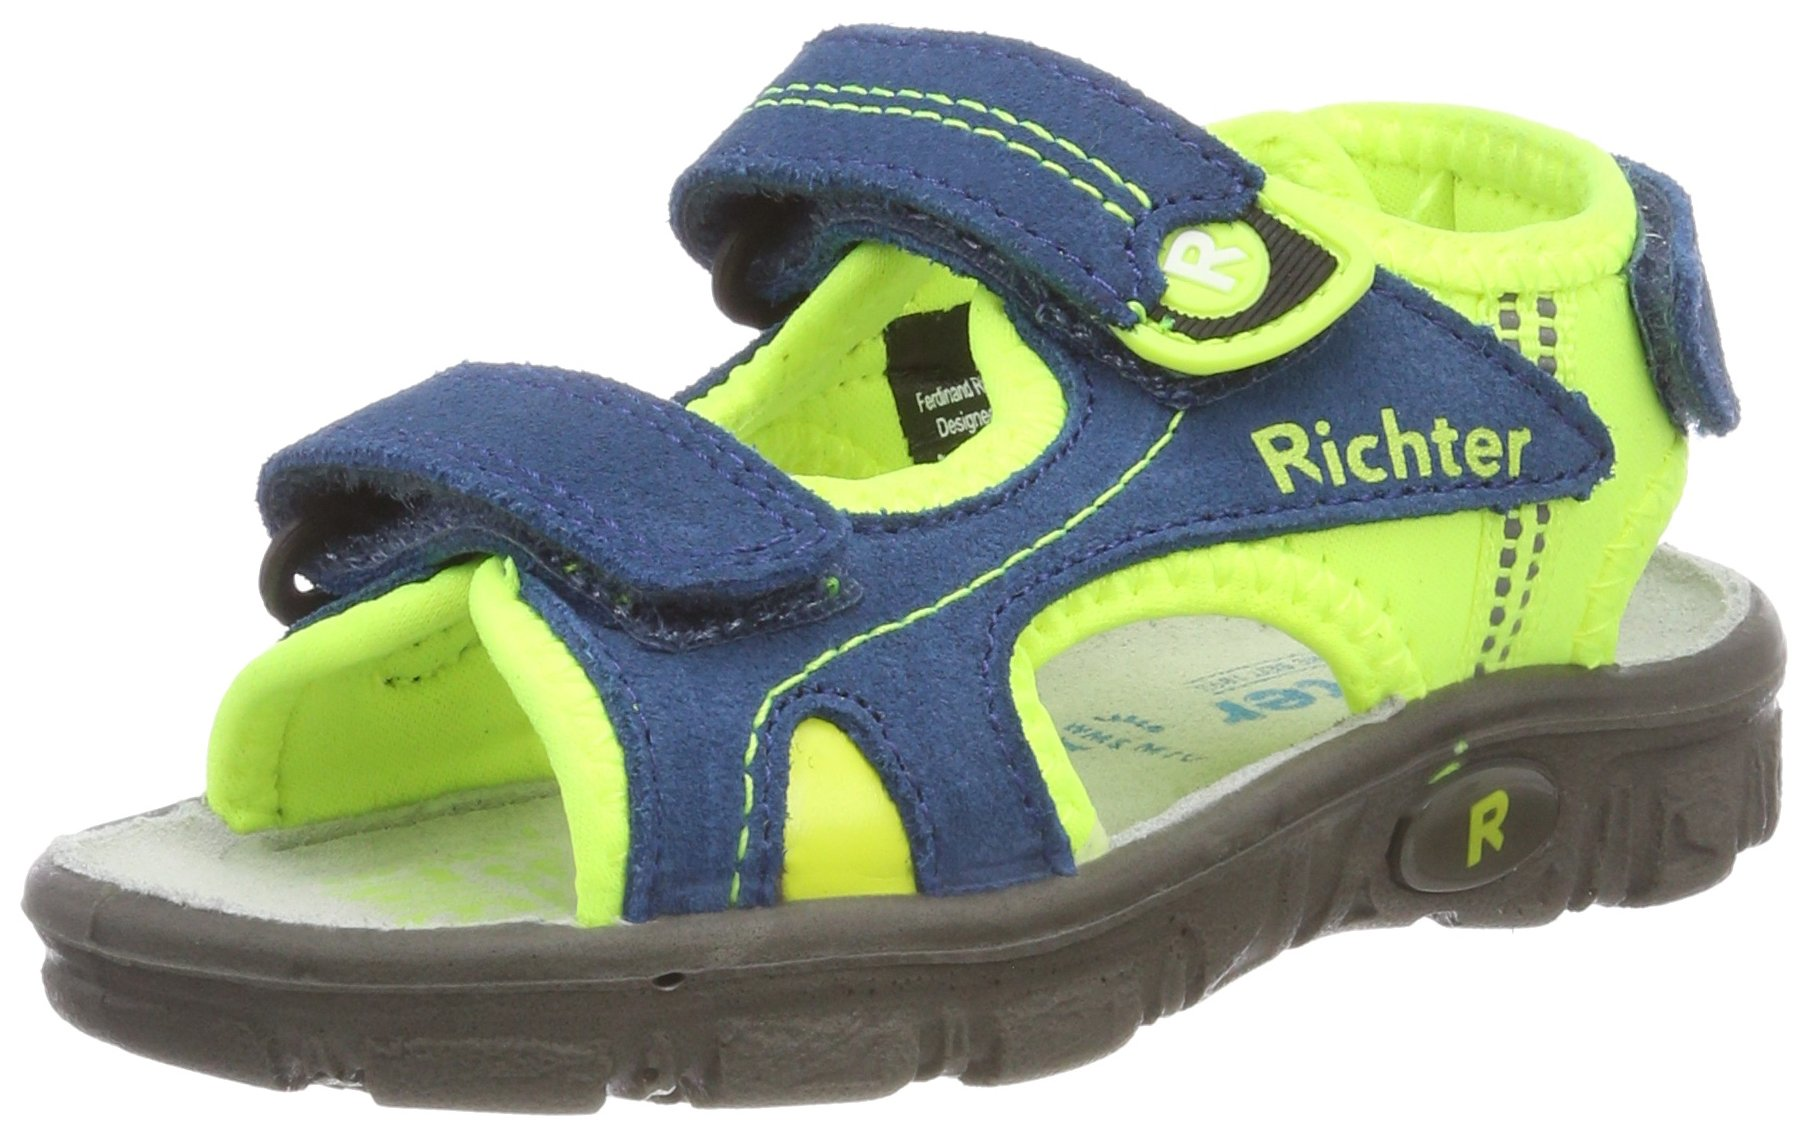 Richter Kinderschuhe Boys 8104-341 Athletic Sandals Blue Size: 13 UK